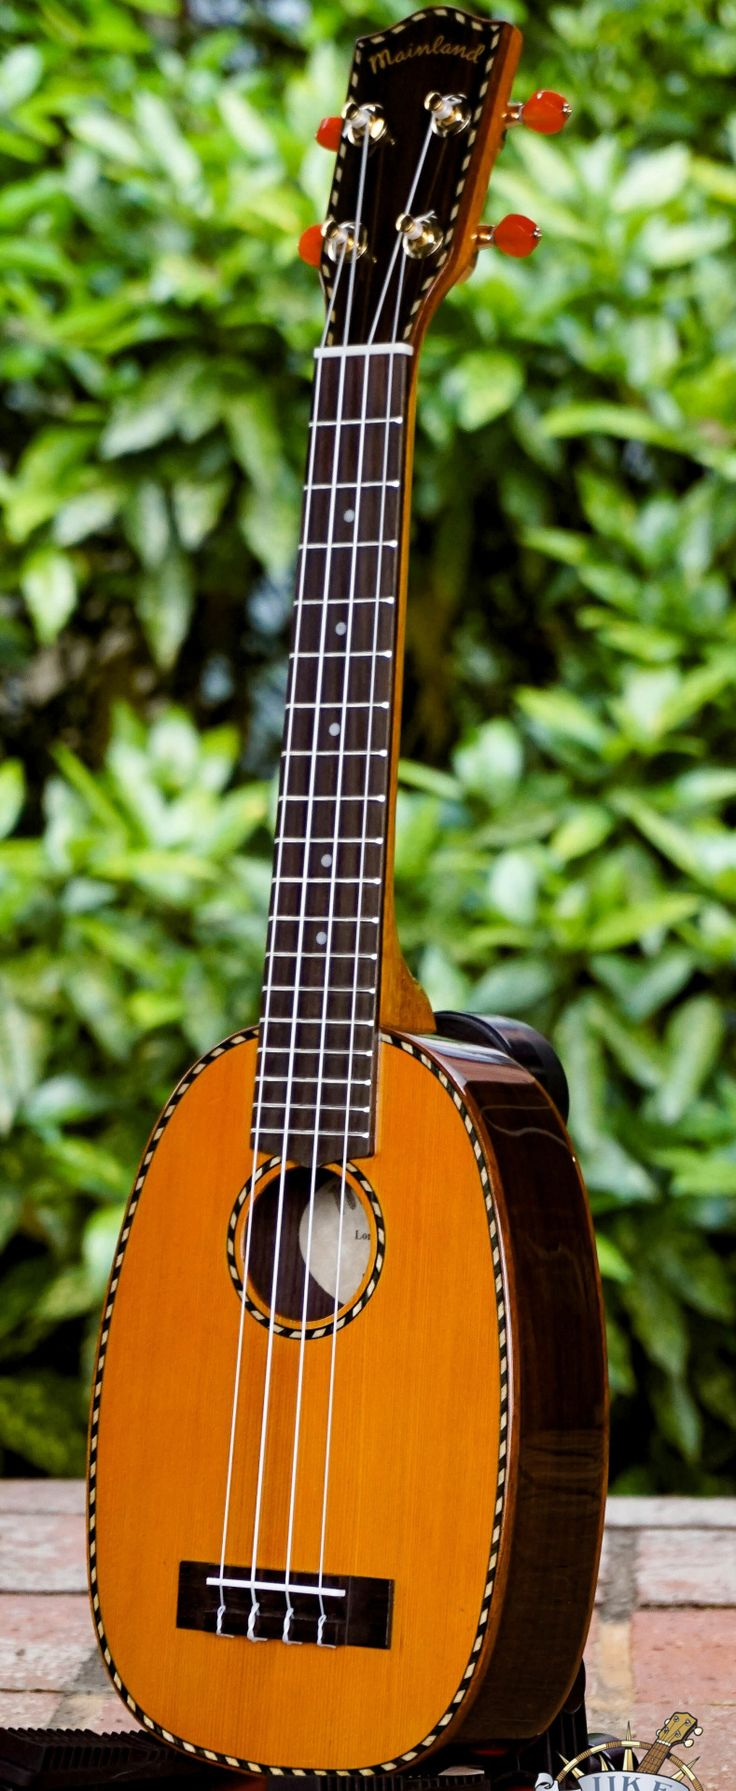 Mainland red cedar long neck Concert Pineapple Ukulele --- https://www.pinterest.com/lardyfatboy/